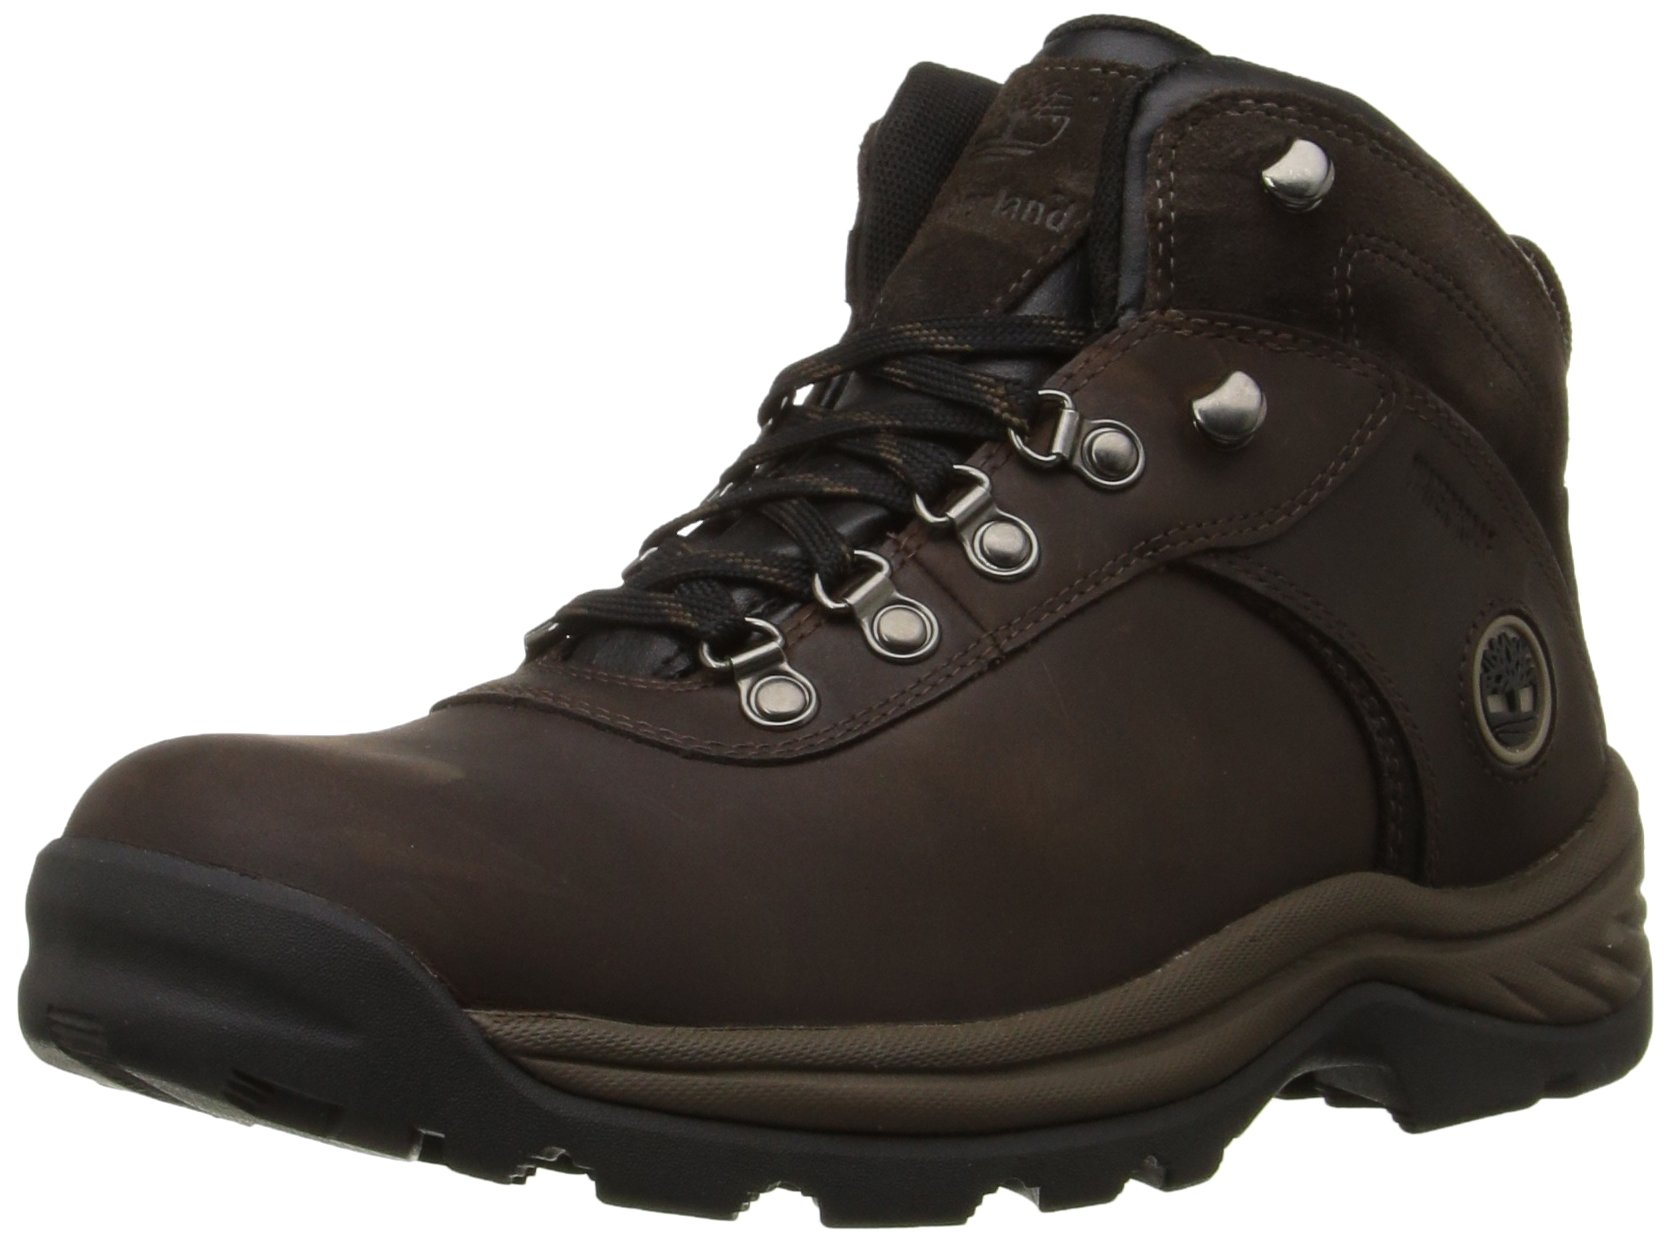 Timberland Men's Flume Waterproof Boot,Dark Brown,10.5 M US by Timberland